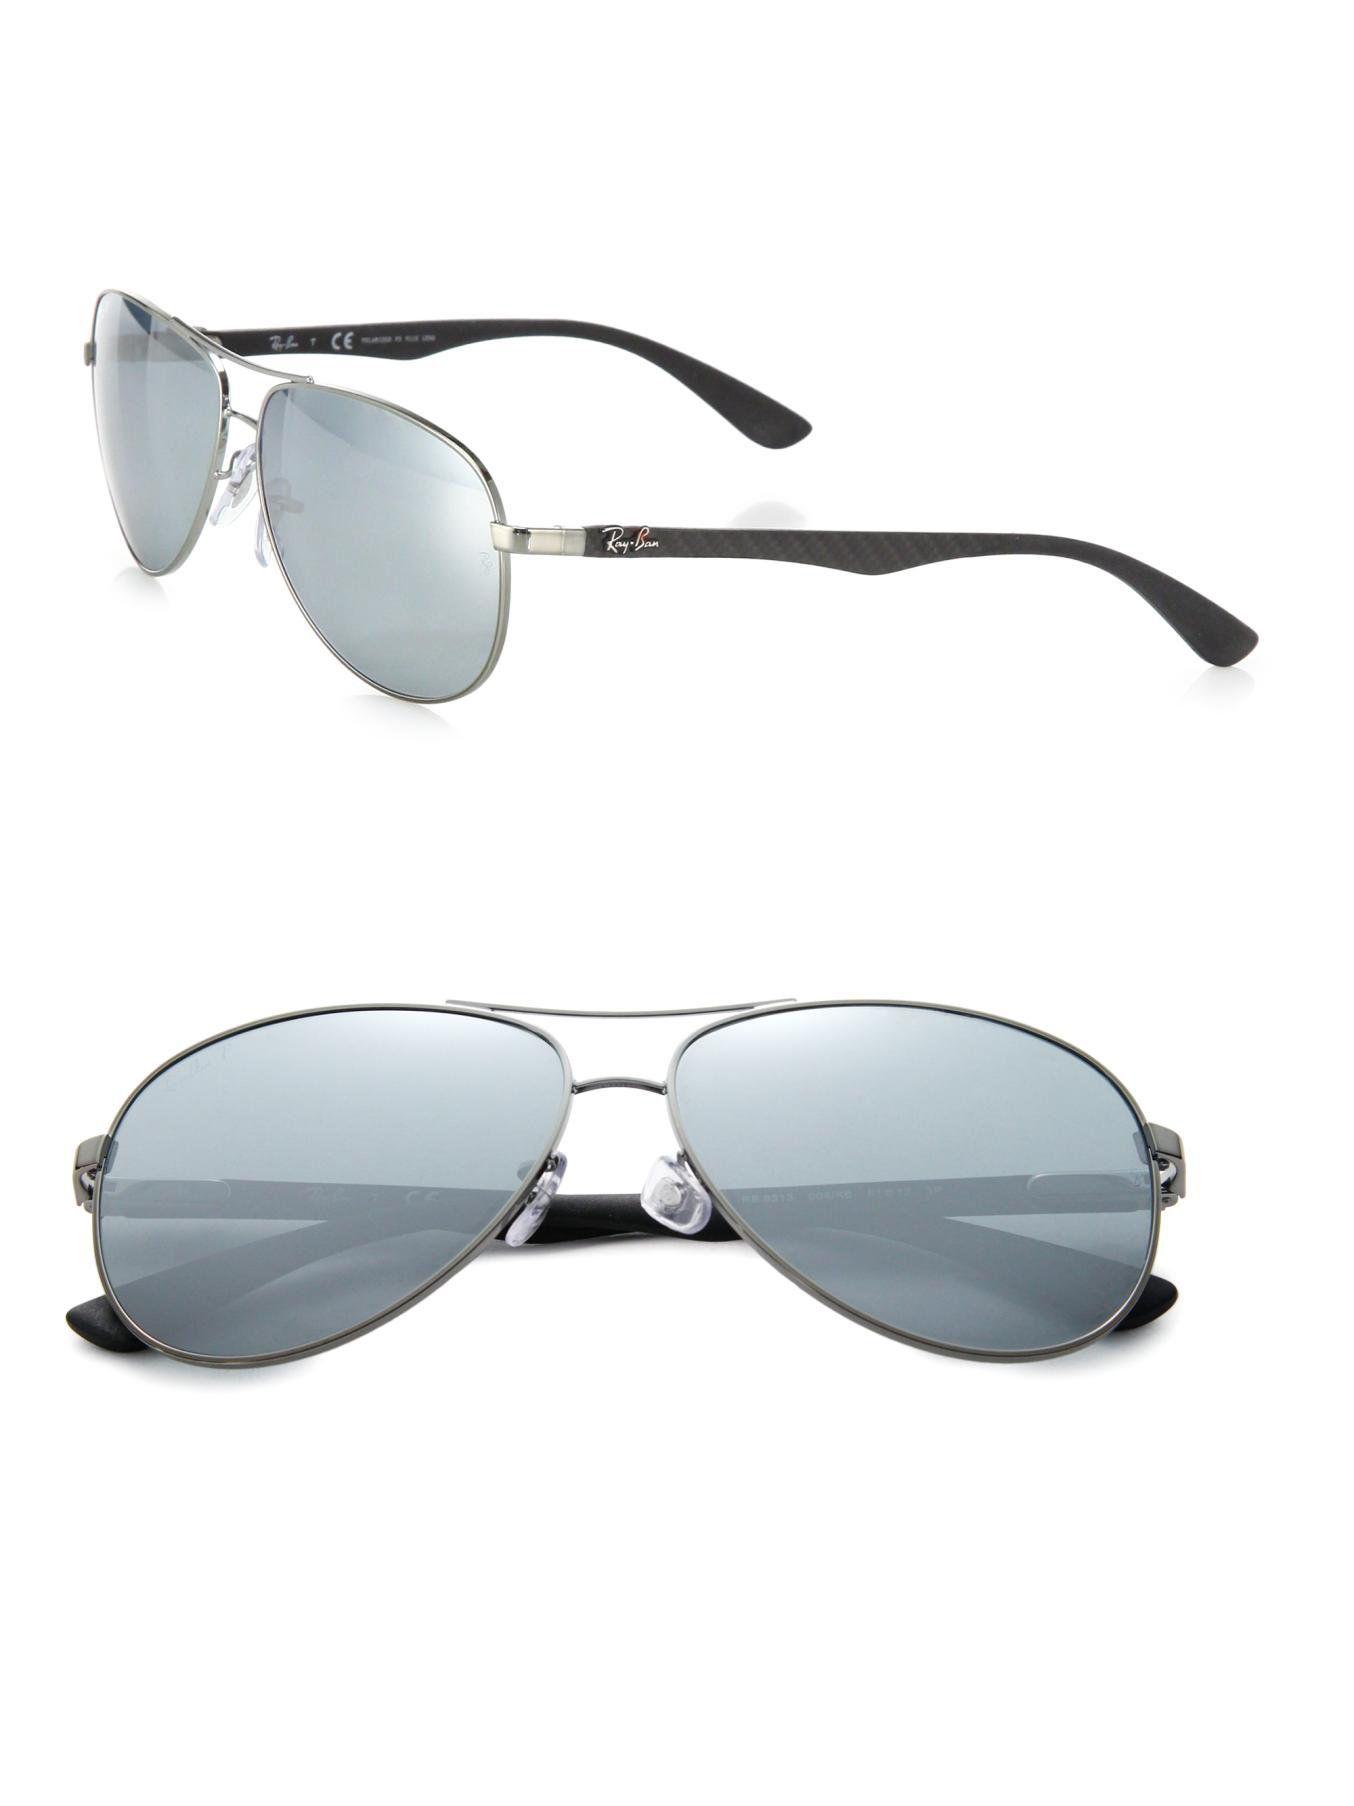 dbc17873553d9 Men s Metallic Pilot 61mm Mirrored Sunglasses